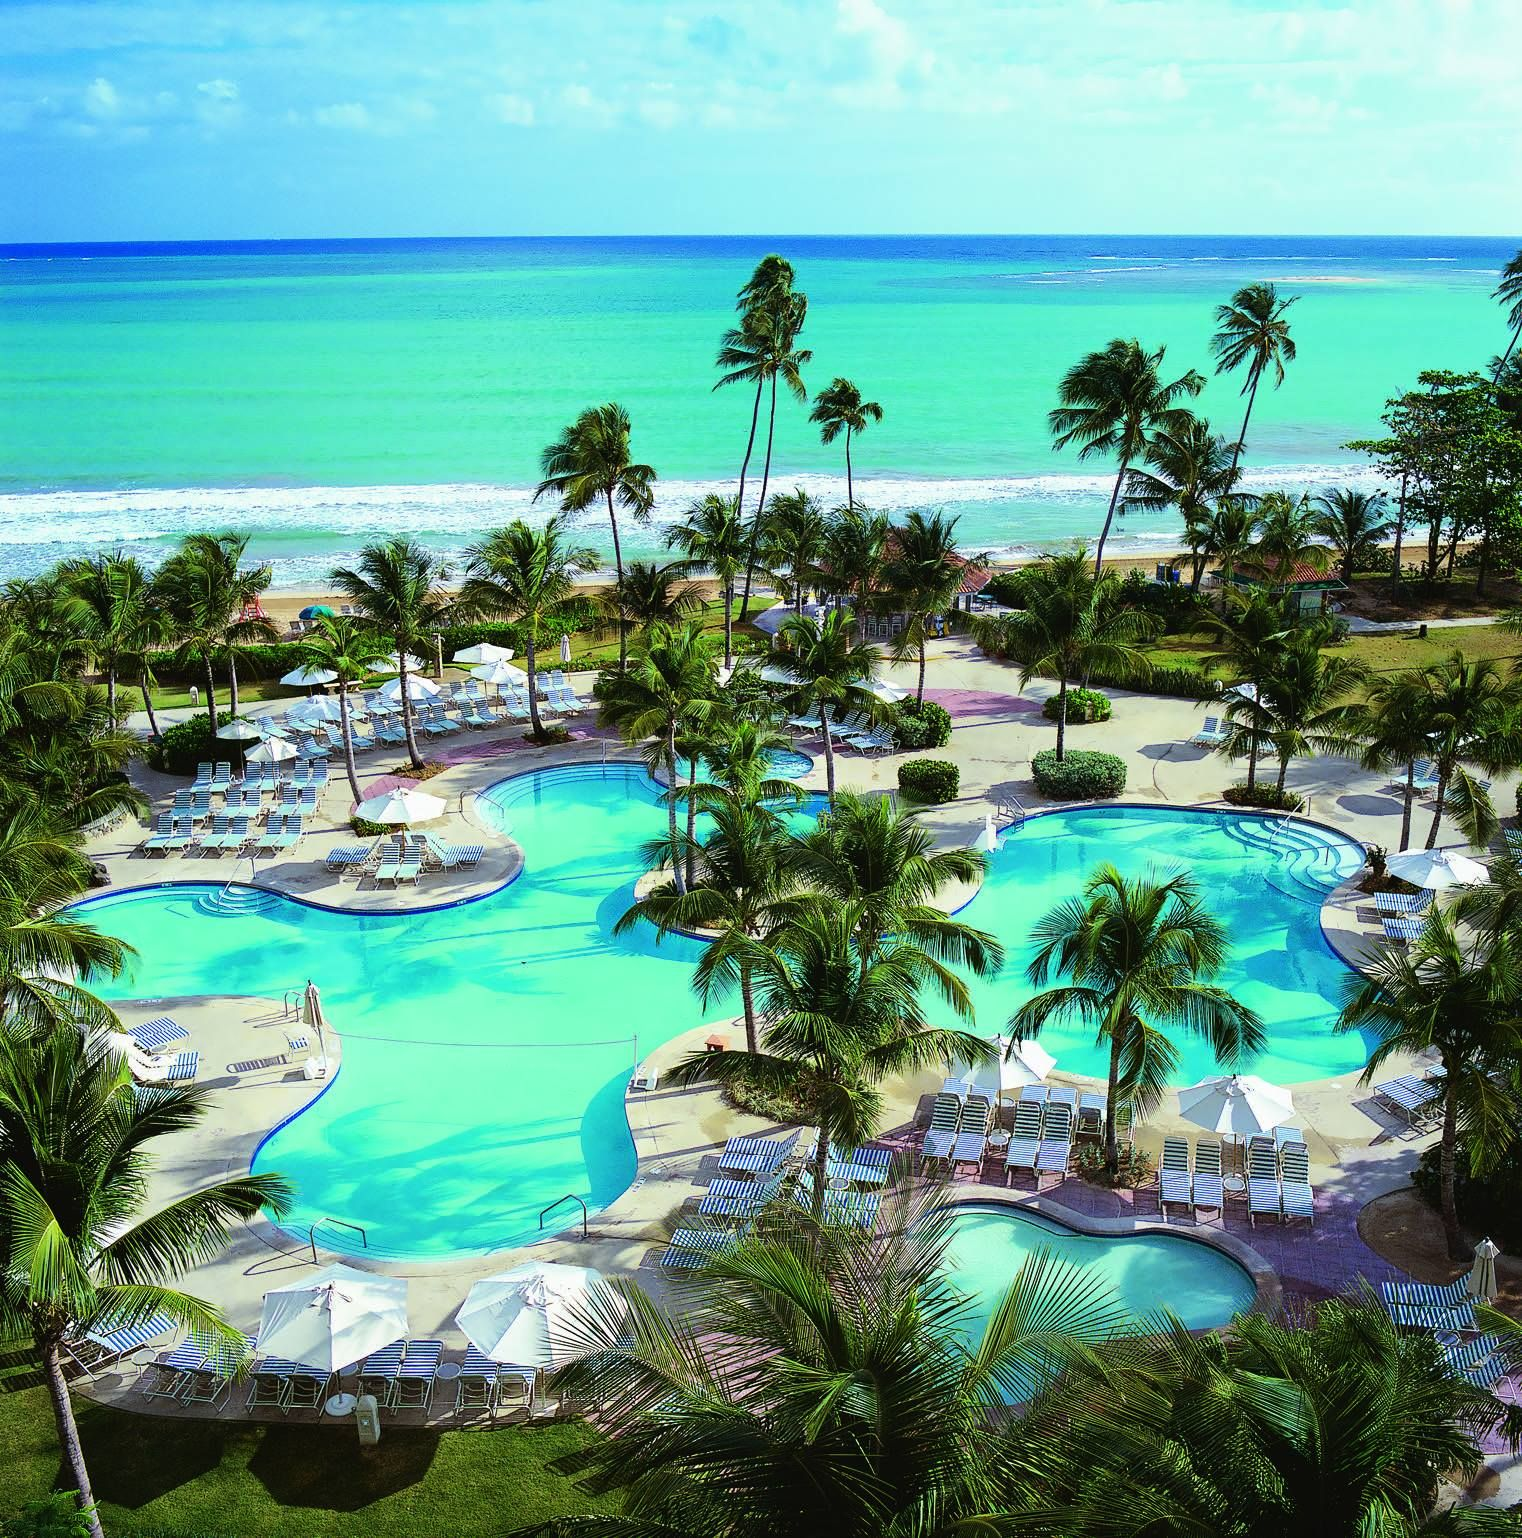 Wyndham St. Thomas Beach View | Favorite Places & Spaces | Pinterest ...